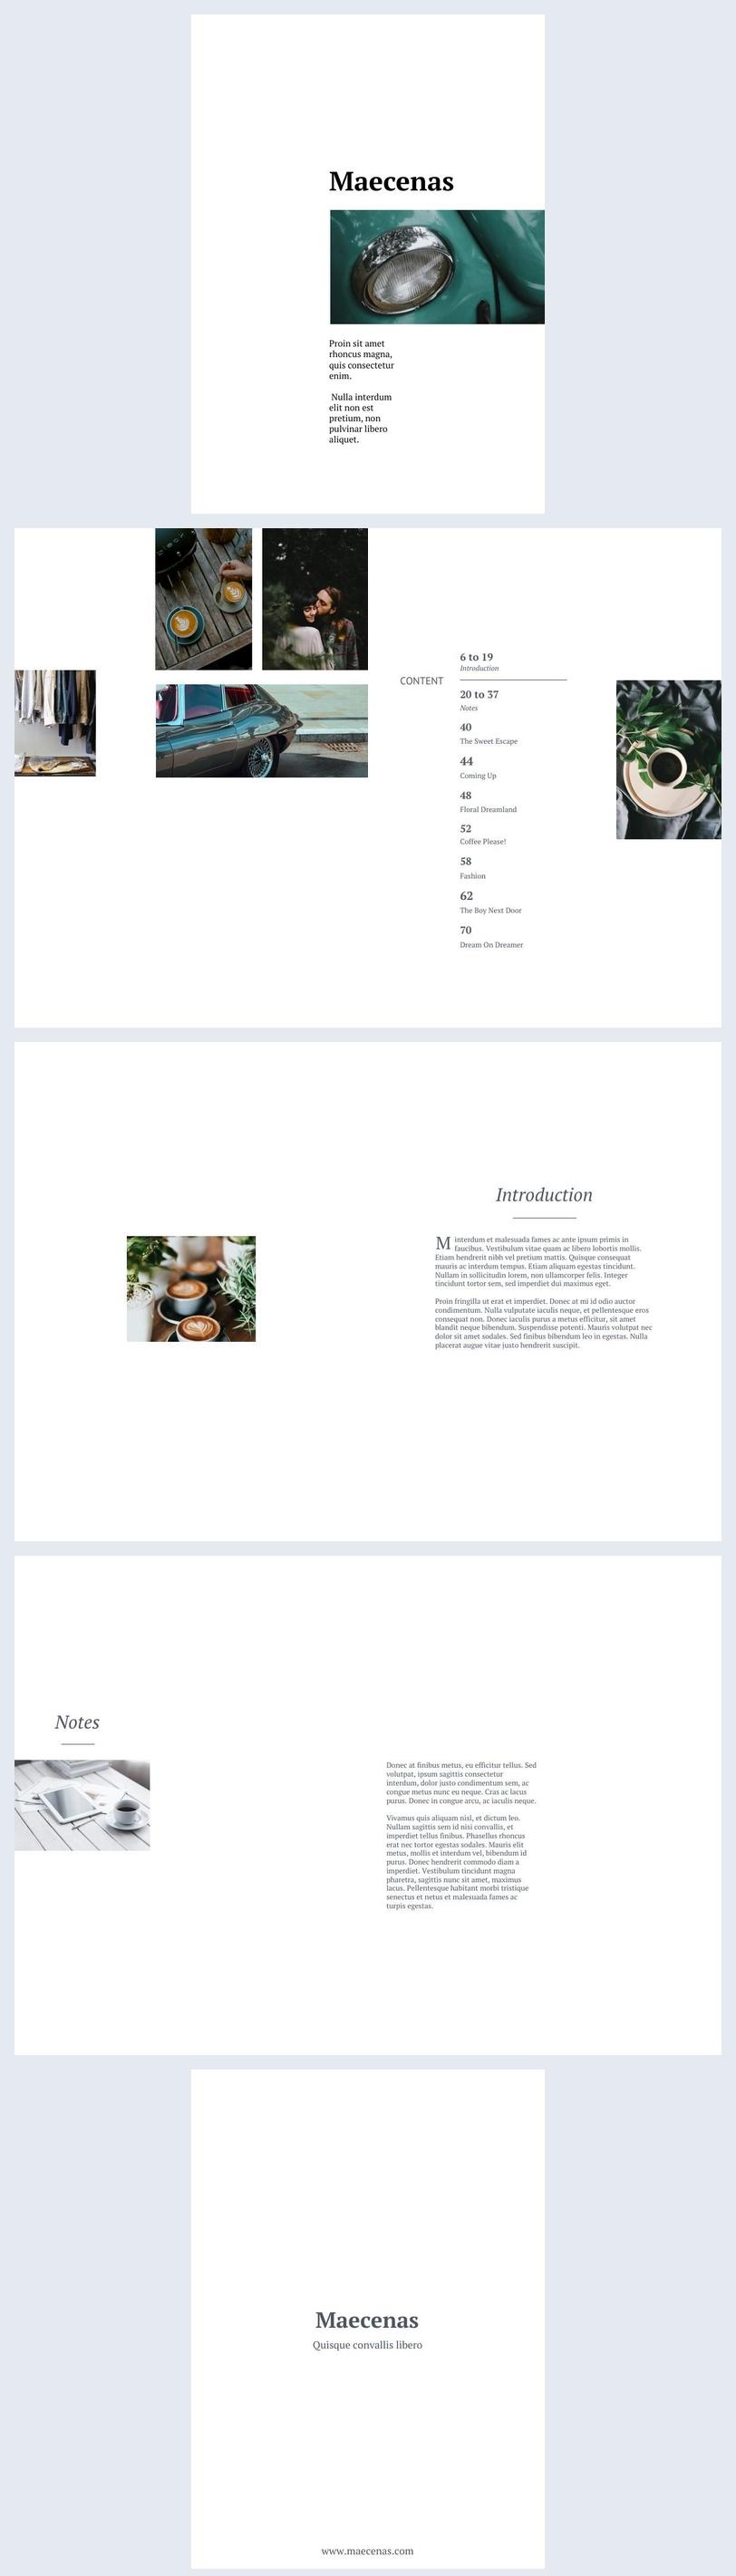 Brochure promotionnelle minimaliste